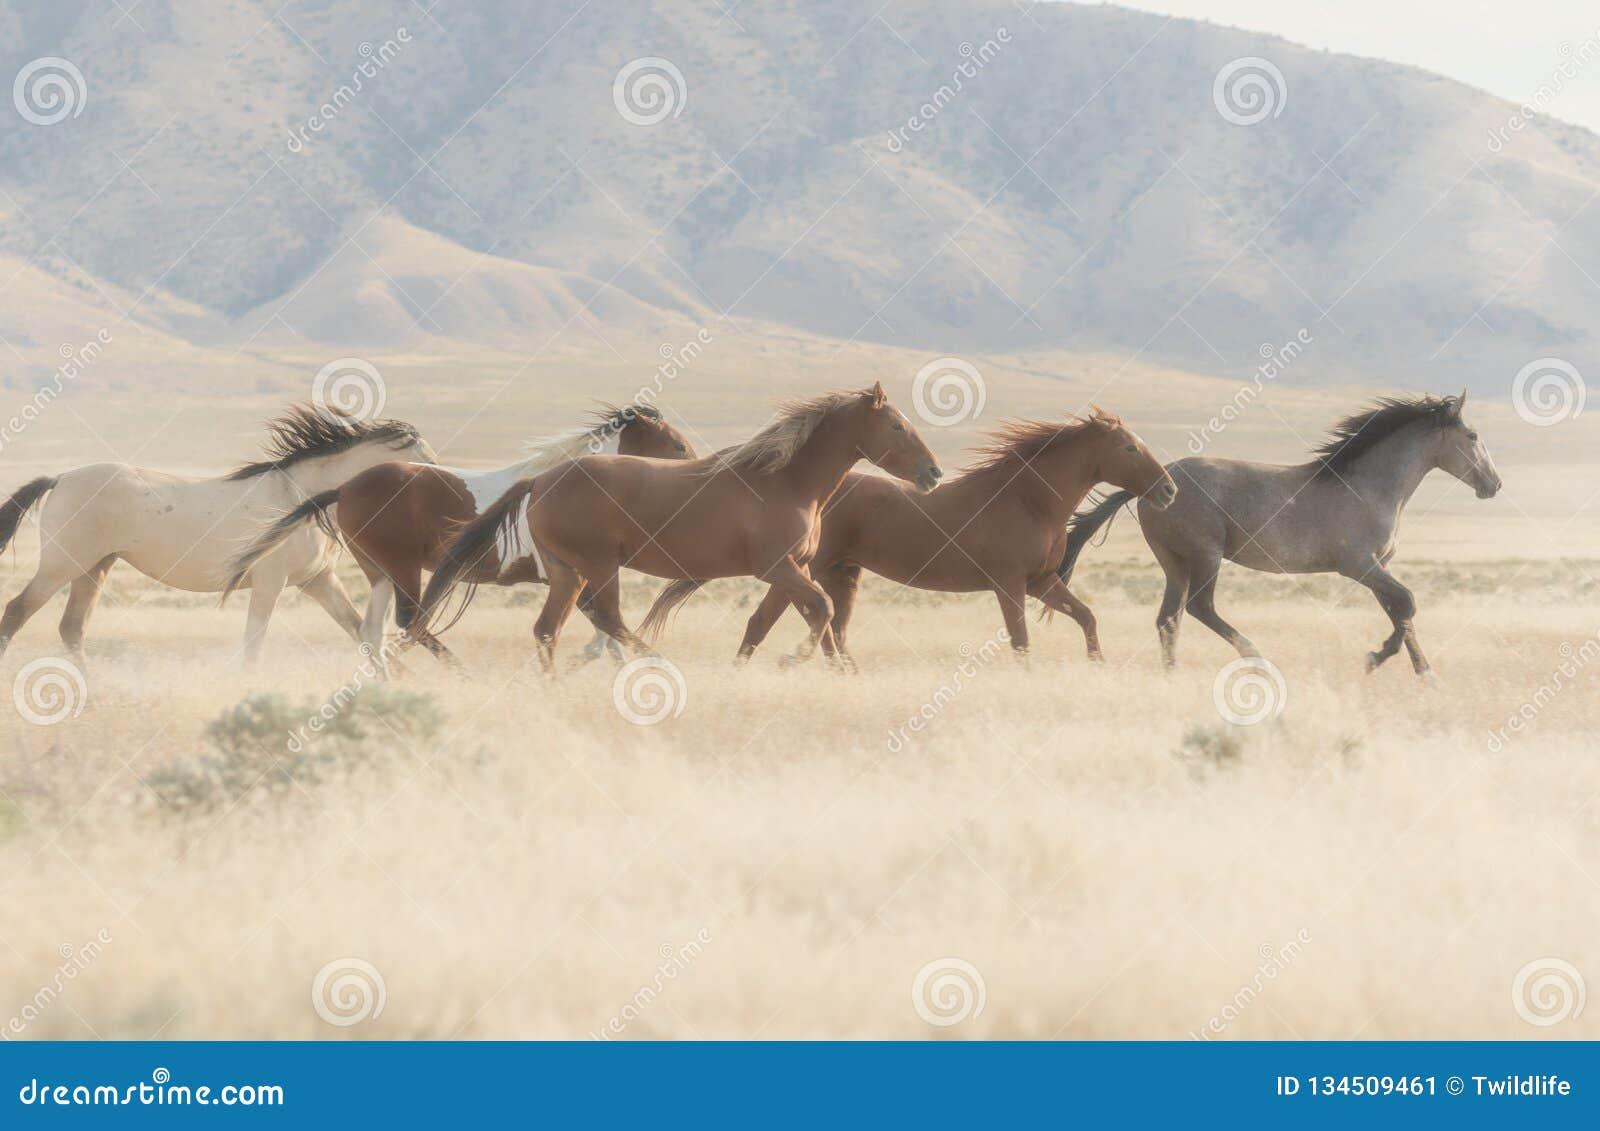 Herd Of Wild Horses Running Stock Image Image Of Dust Americana 134509461